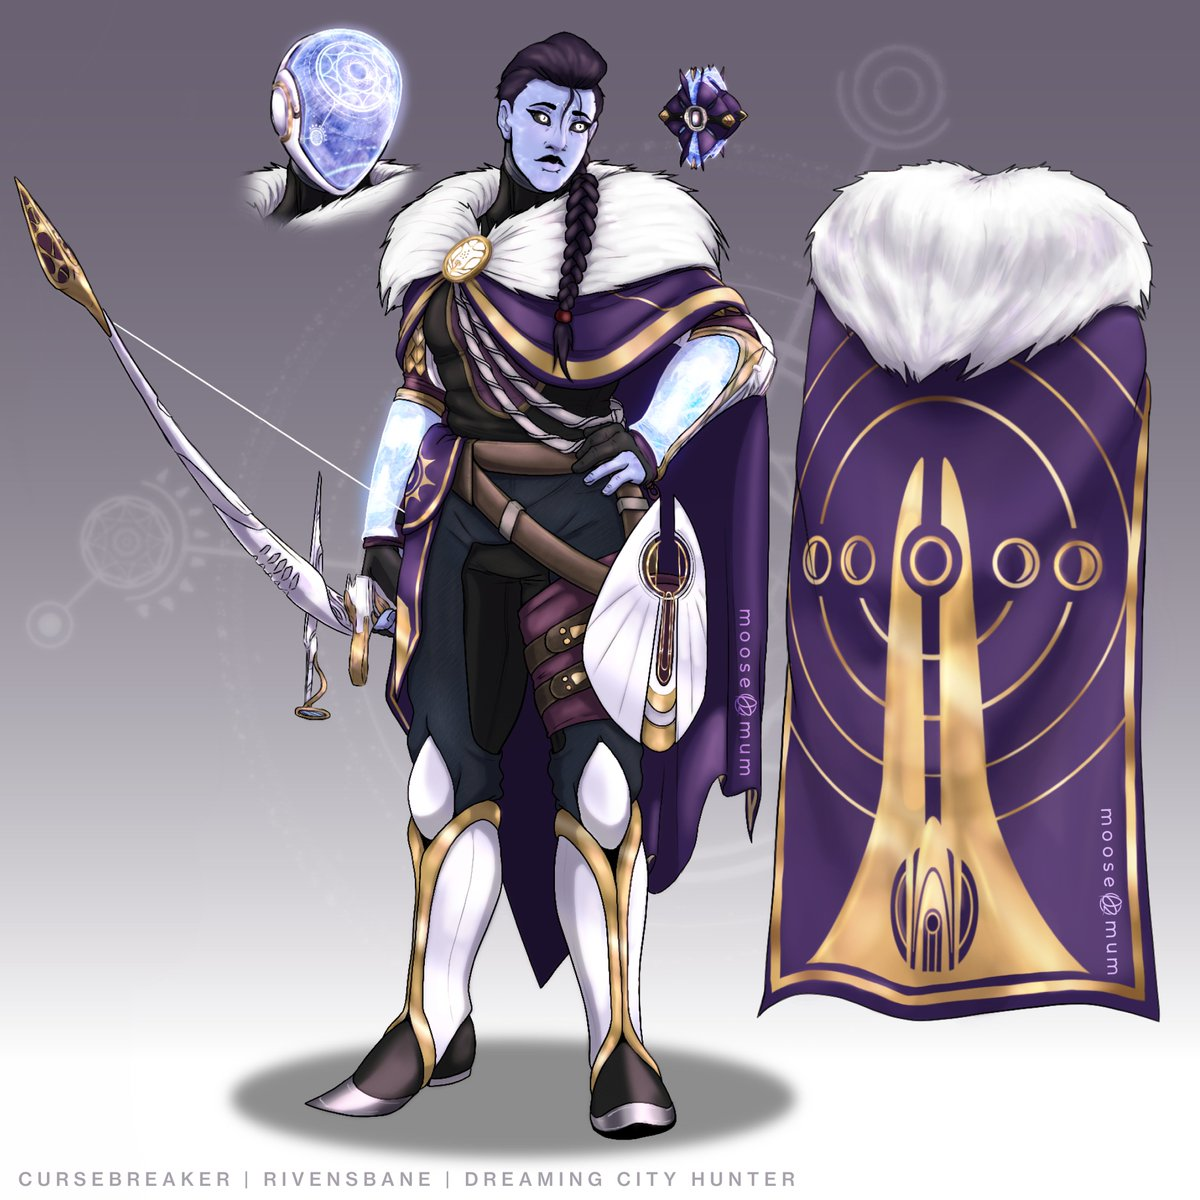 Rivensbane/Cursebreaker Hunter Armor Concept